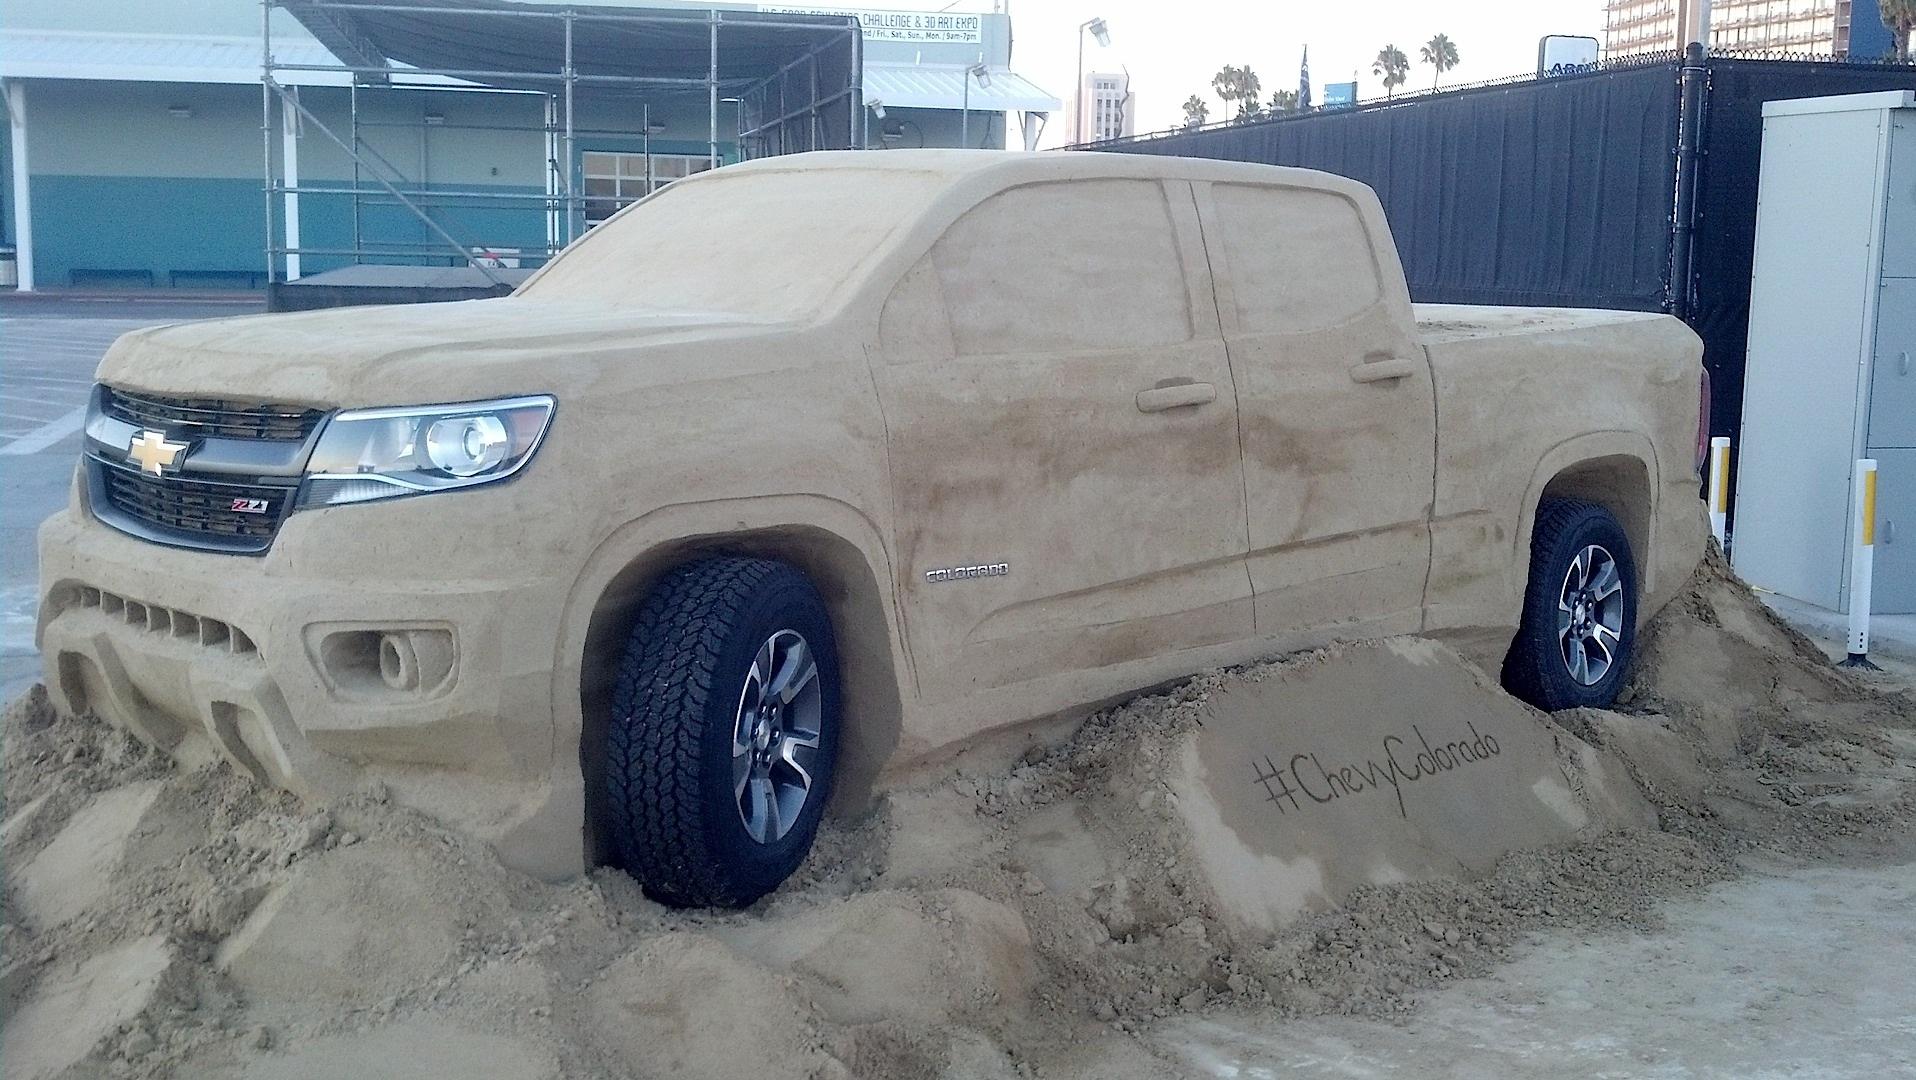 Chevrolet Colorado Z71 >> 2015 Chevrolet Colorado Gets a Sand Sculpture - autoevolution